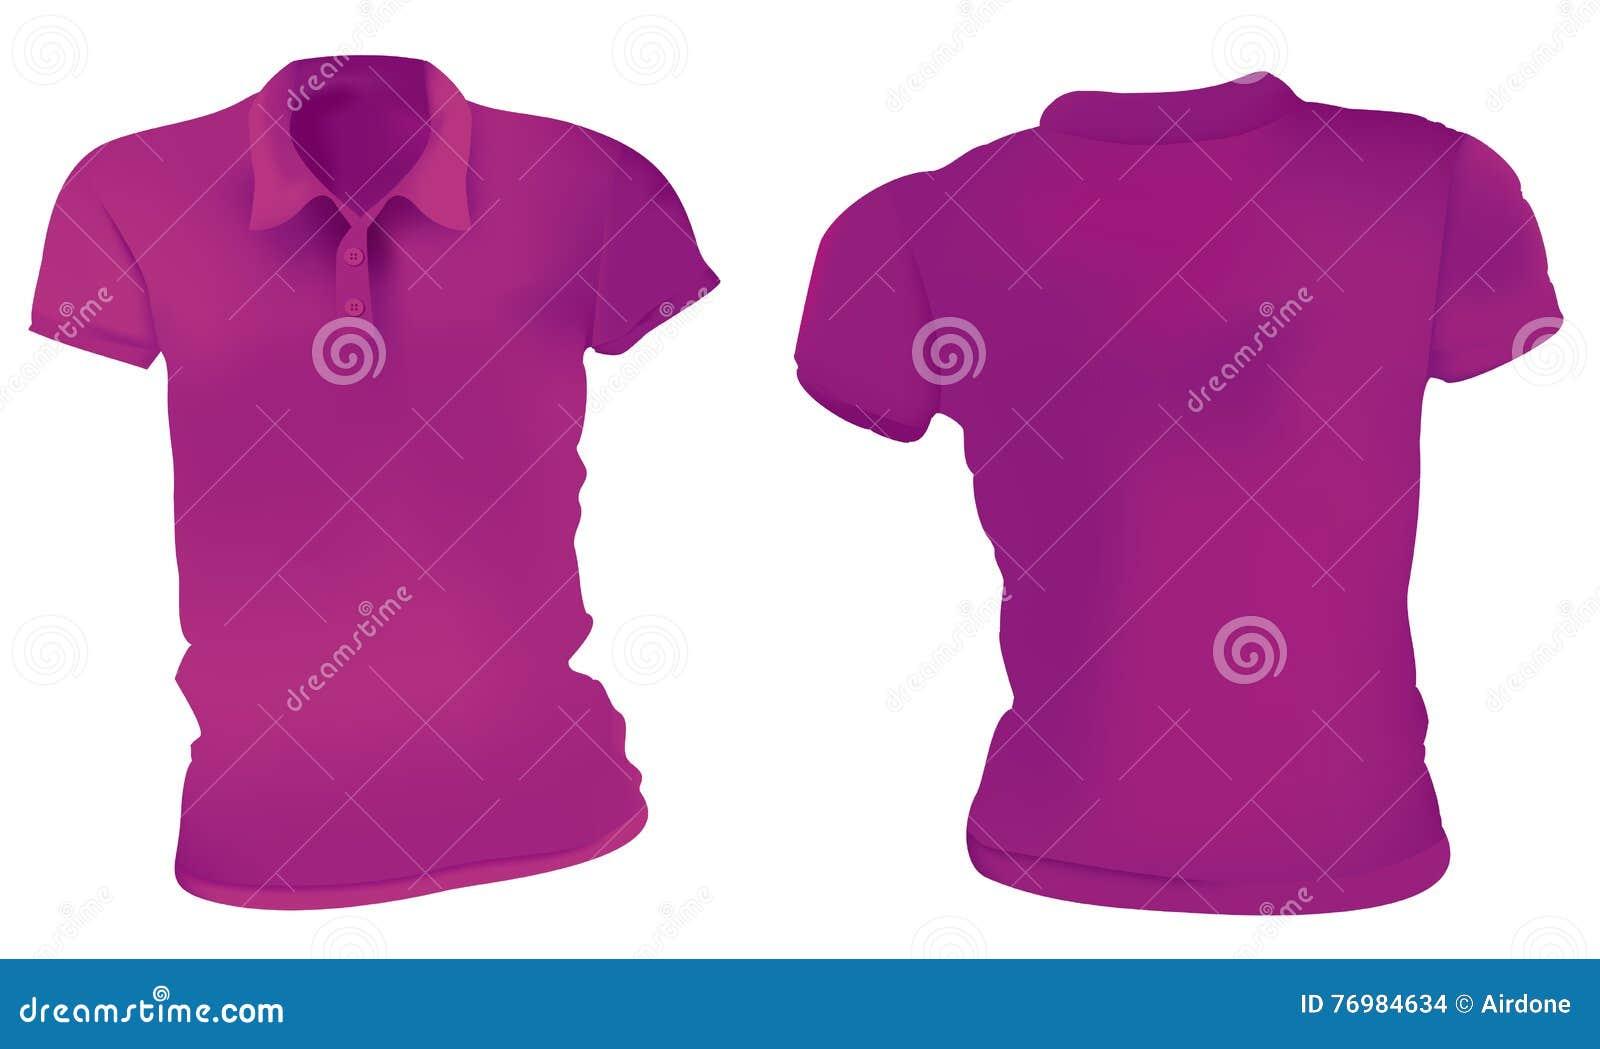 Women Purple Polo Shirts Template Stock Vector Illustration Of